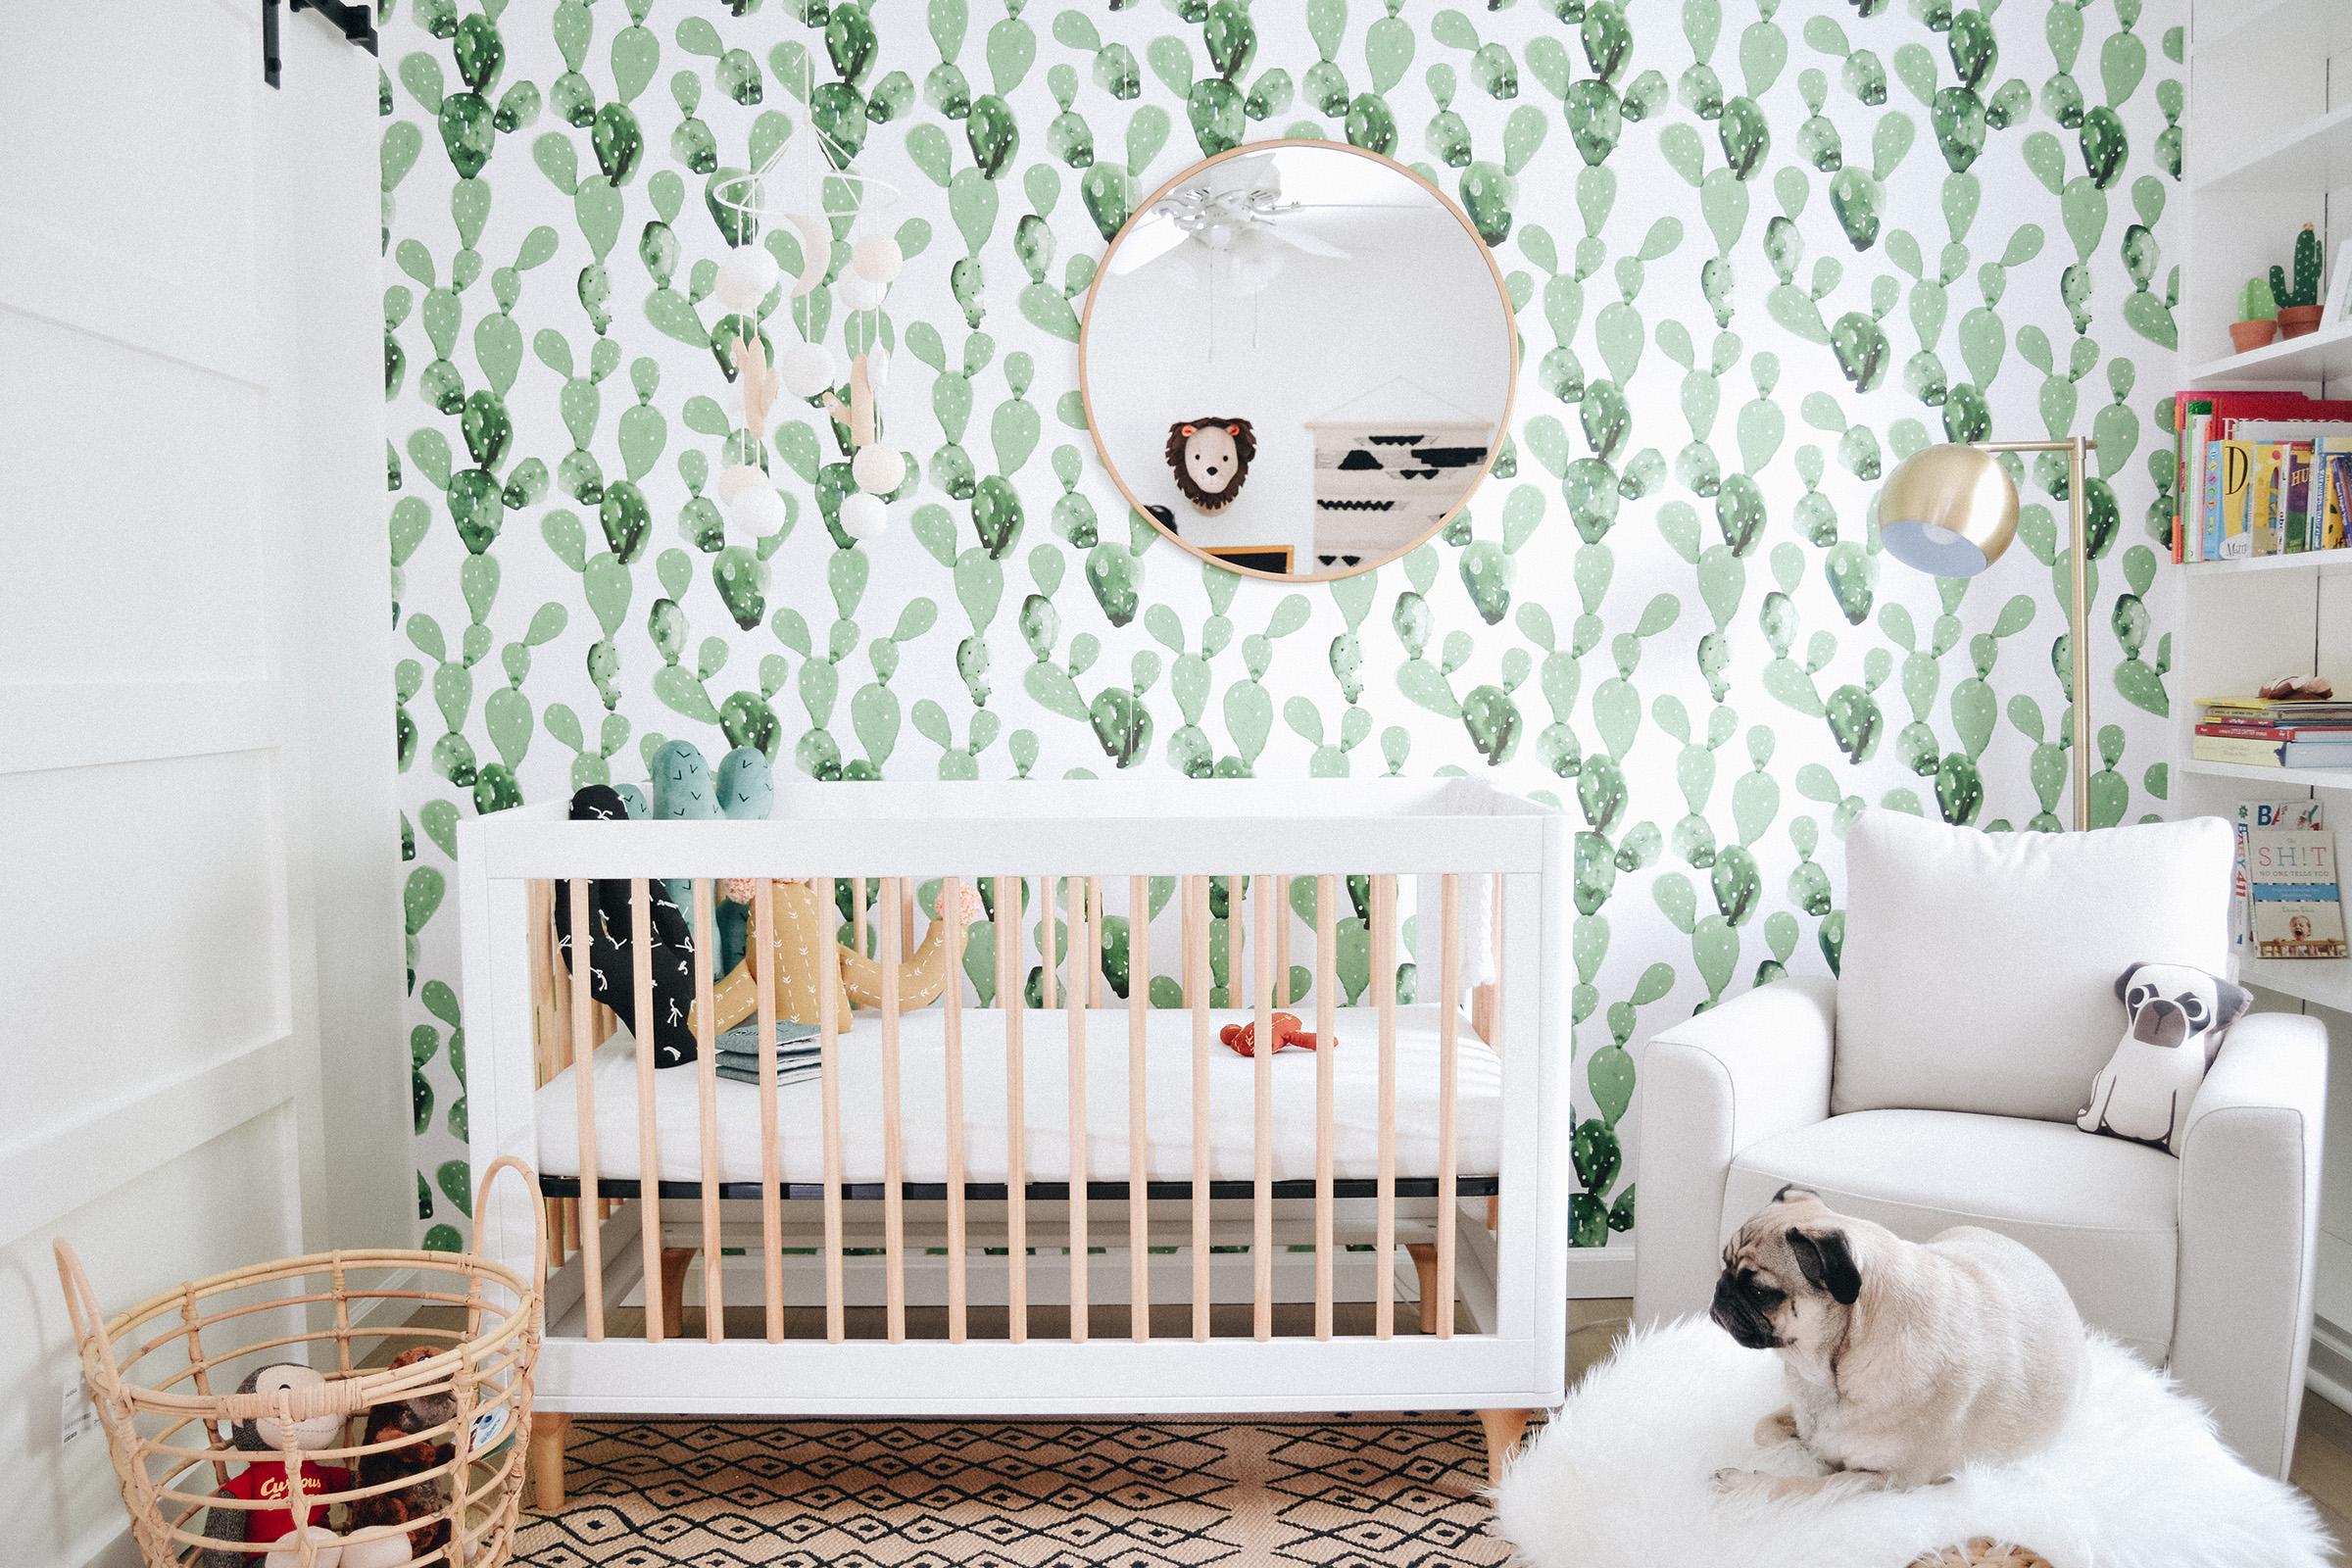 Llewyn S Cactus Boho Modern Nursery Project Nursery